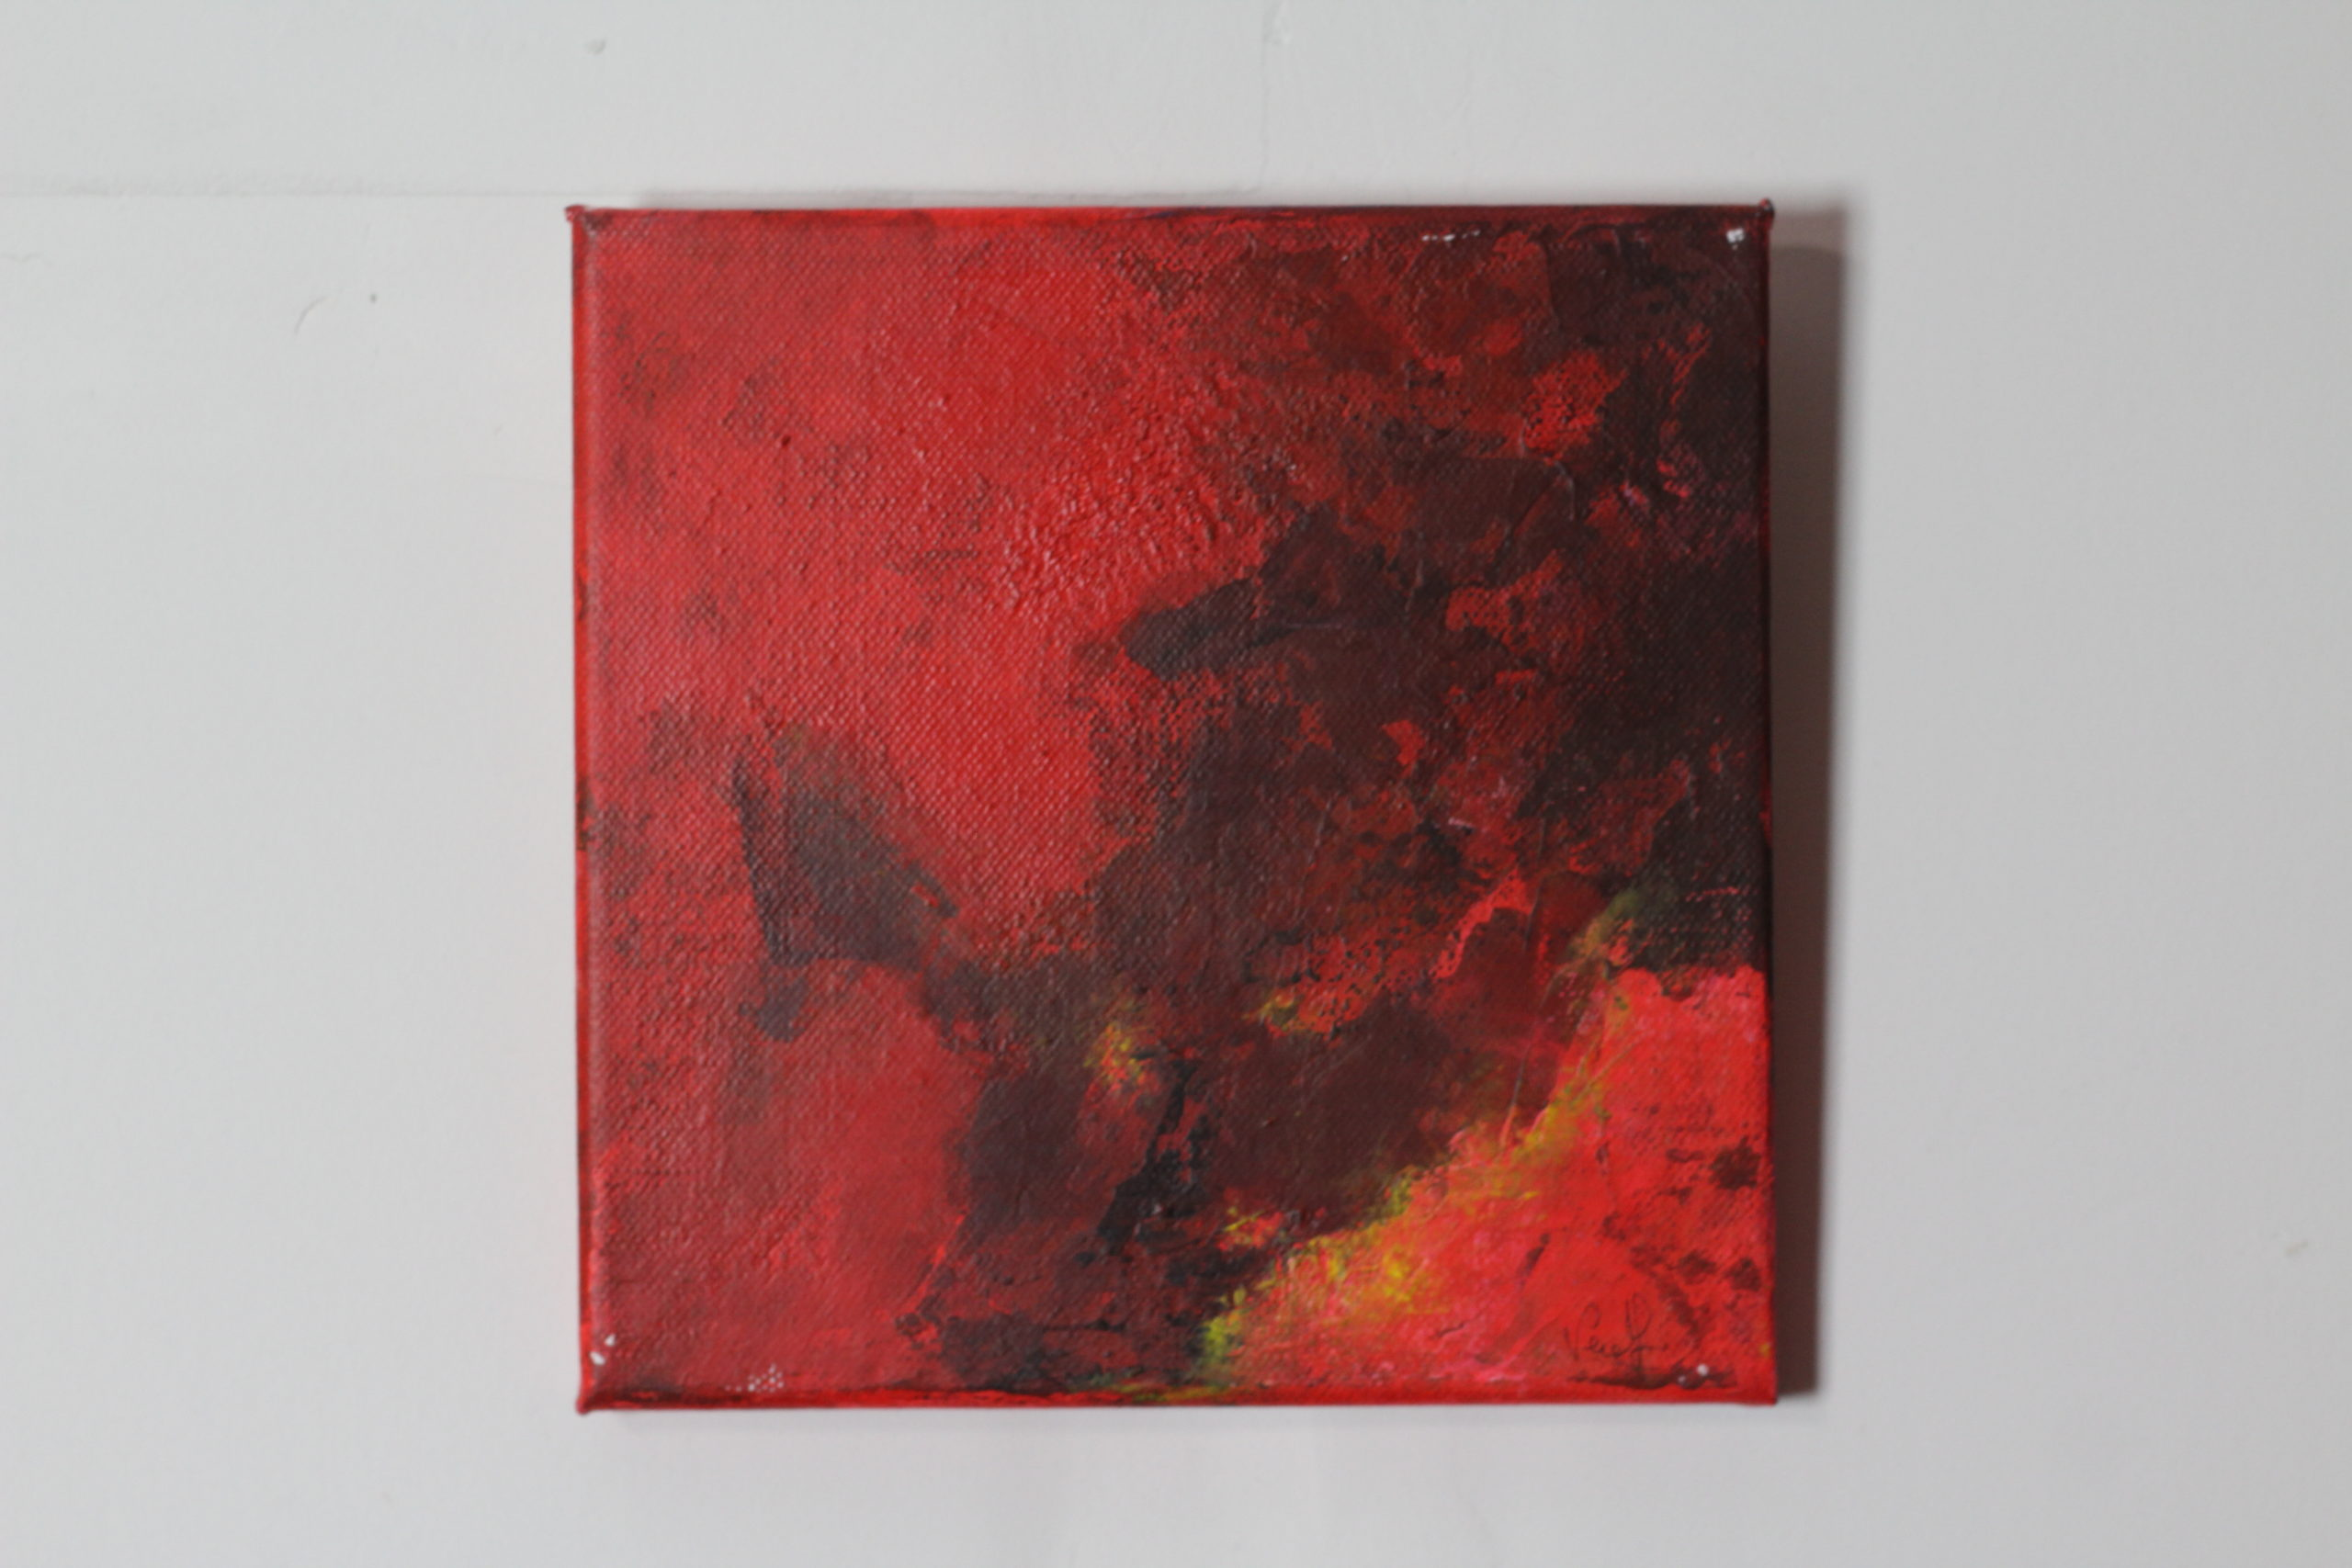 Peinture : Nature 2 20x20 (Véronique Fuchs-Sublon)